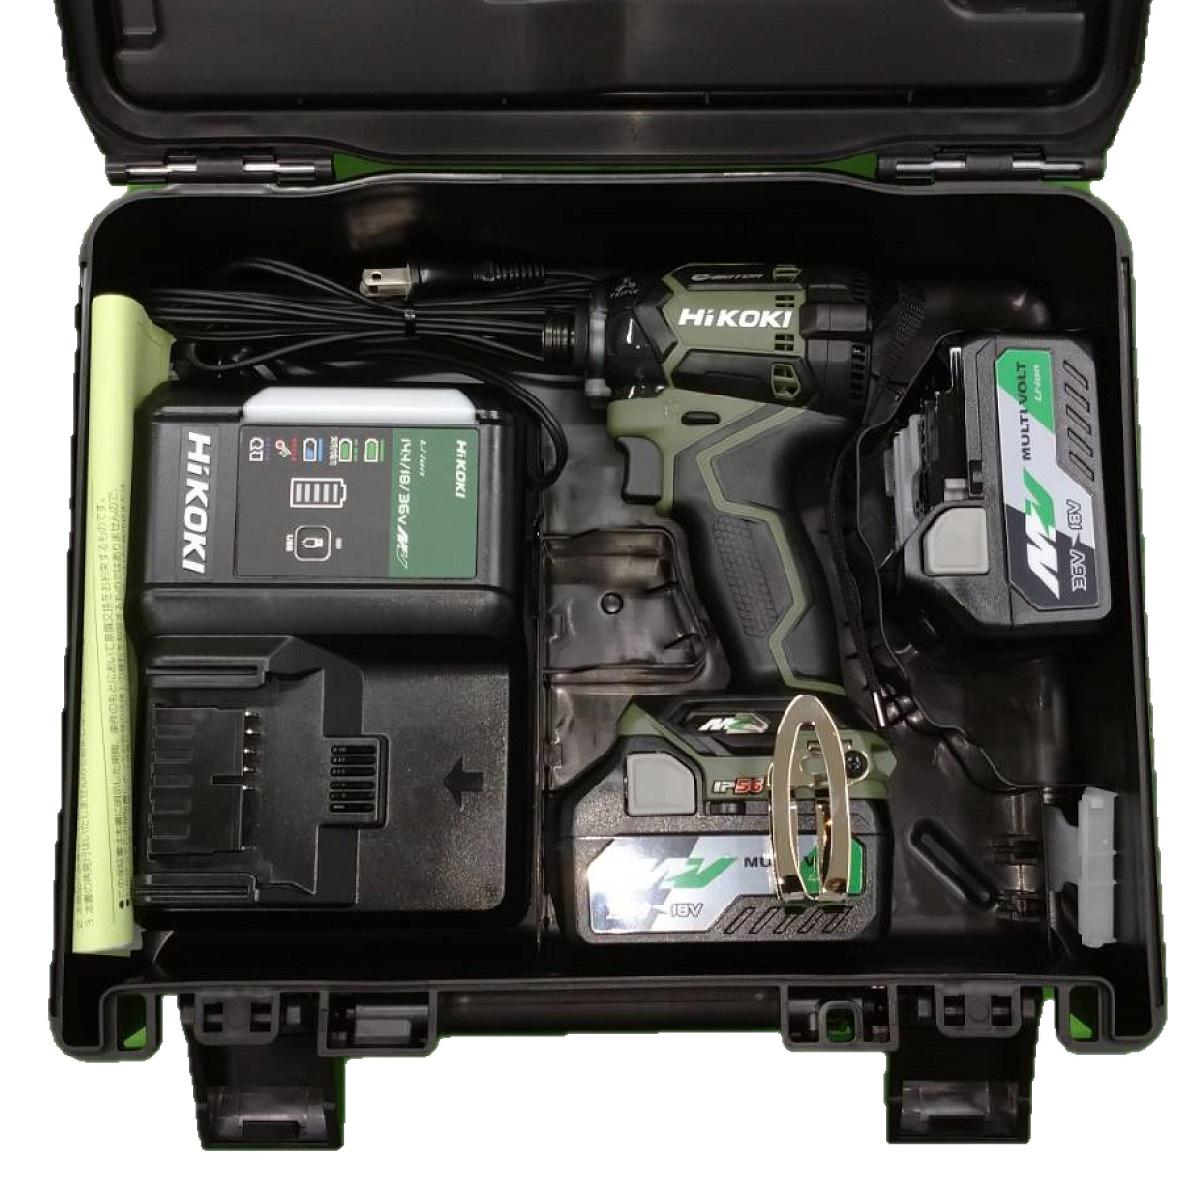 HiKOKIコードレスインパクトドライバ 36V WH36DC2XPGフォレストグリーンが入荷 在庫台数限定 HiKOKI ハイコーキ WH36DC 登場大人気アイテム 2XPG 日立工機 コードレスインパクトドライバ セット内容 急速充電器UC18YDL2 フォレストグリーン 新作製品 世界最高品質人気 36Vマルチボルト 約25分 ケース付 離島は別途送料が必要 BSL36A18×2個 ※沖縄